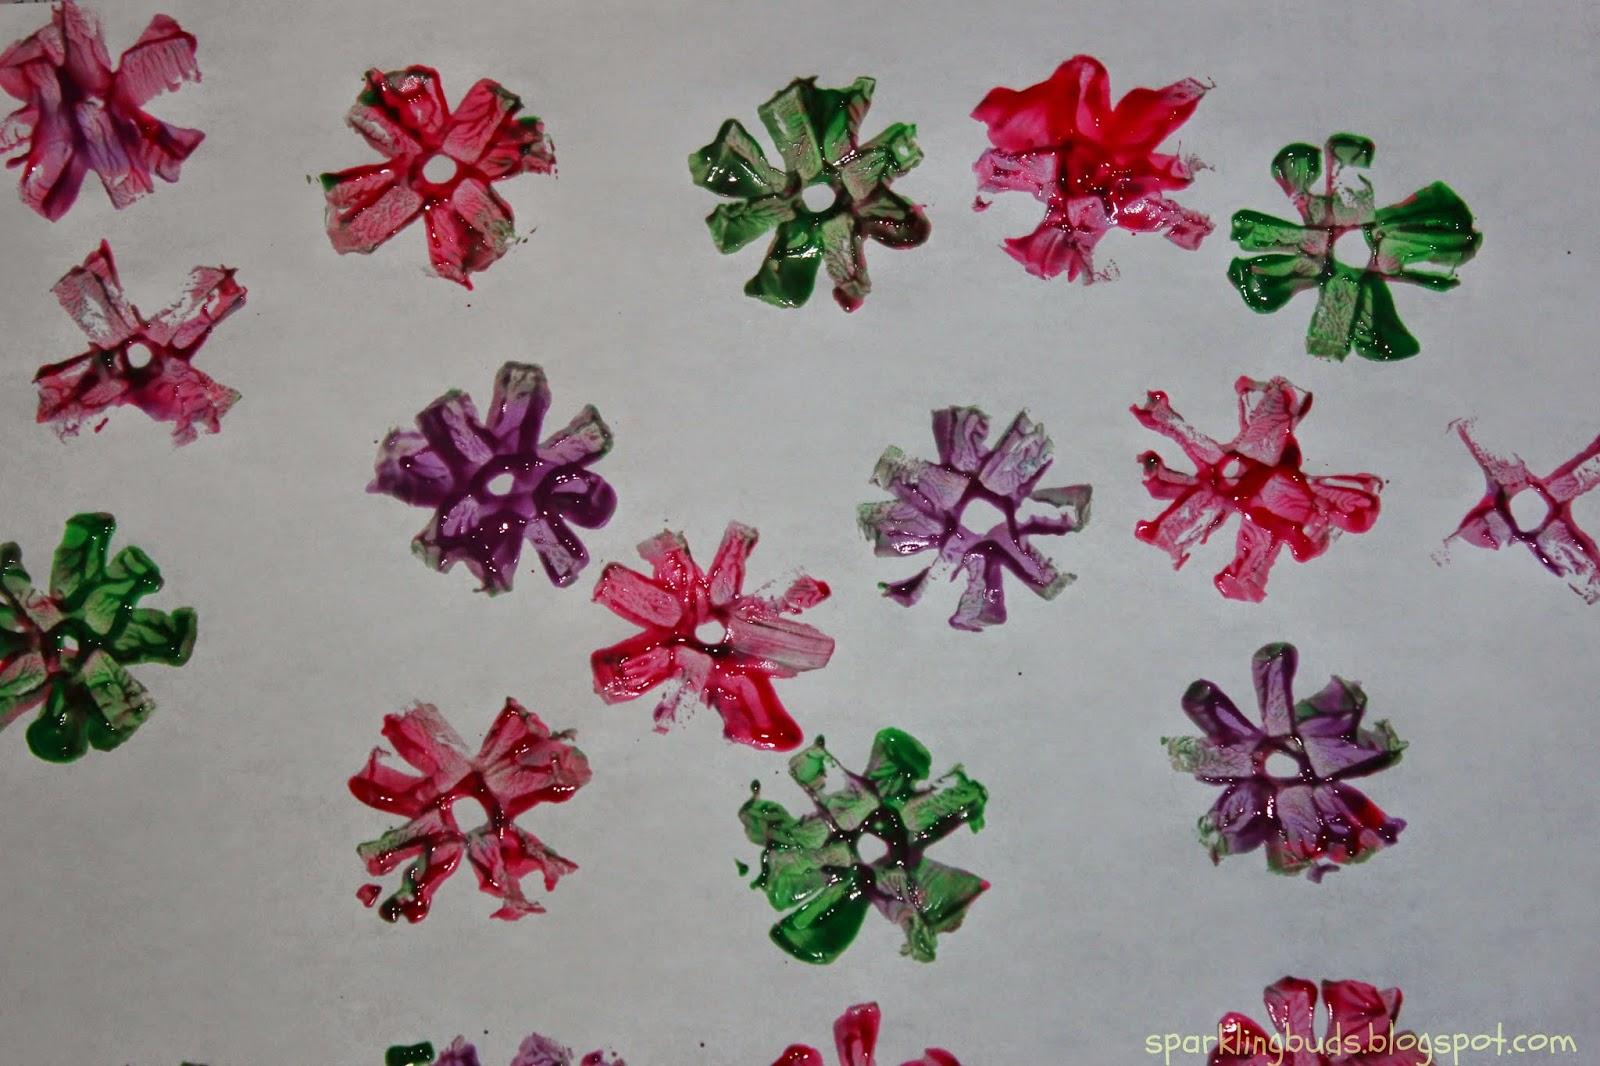 http://sparklingbuds.blogspot.com/2014/05/paper-flower-stamping.html